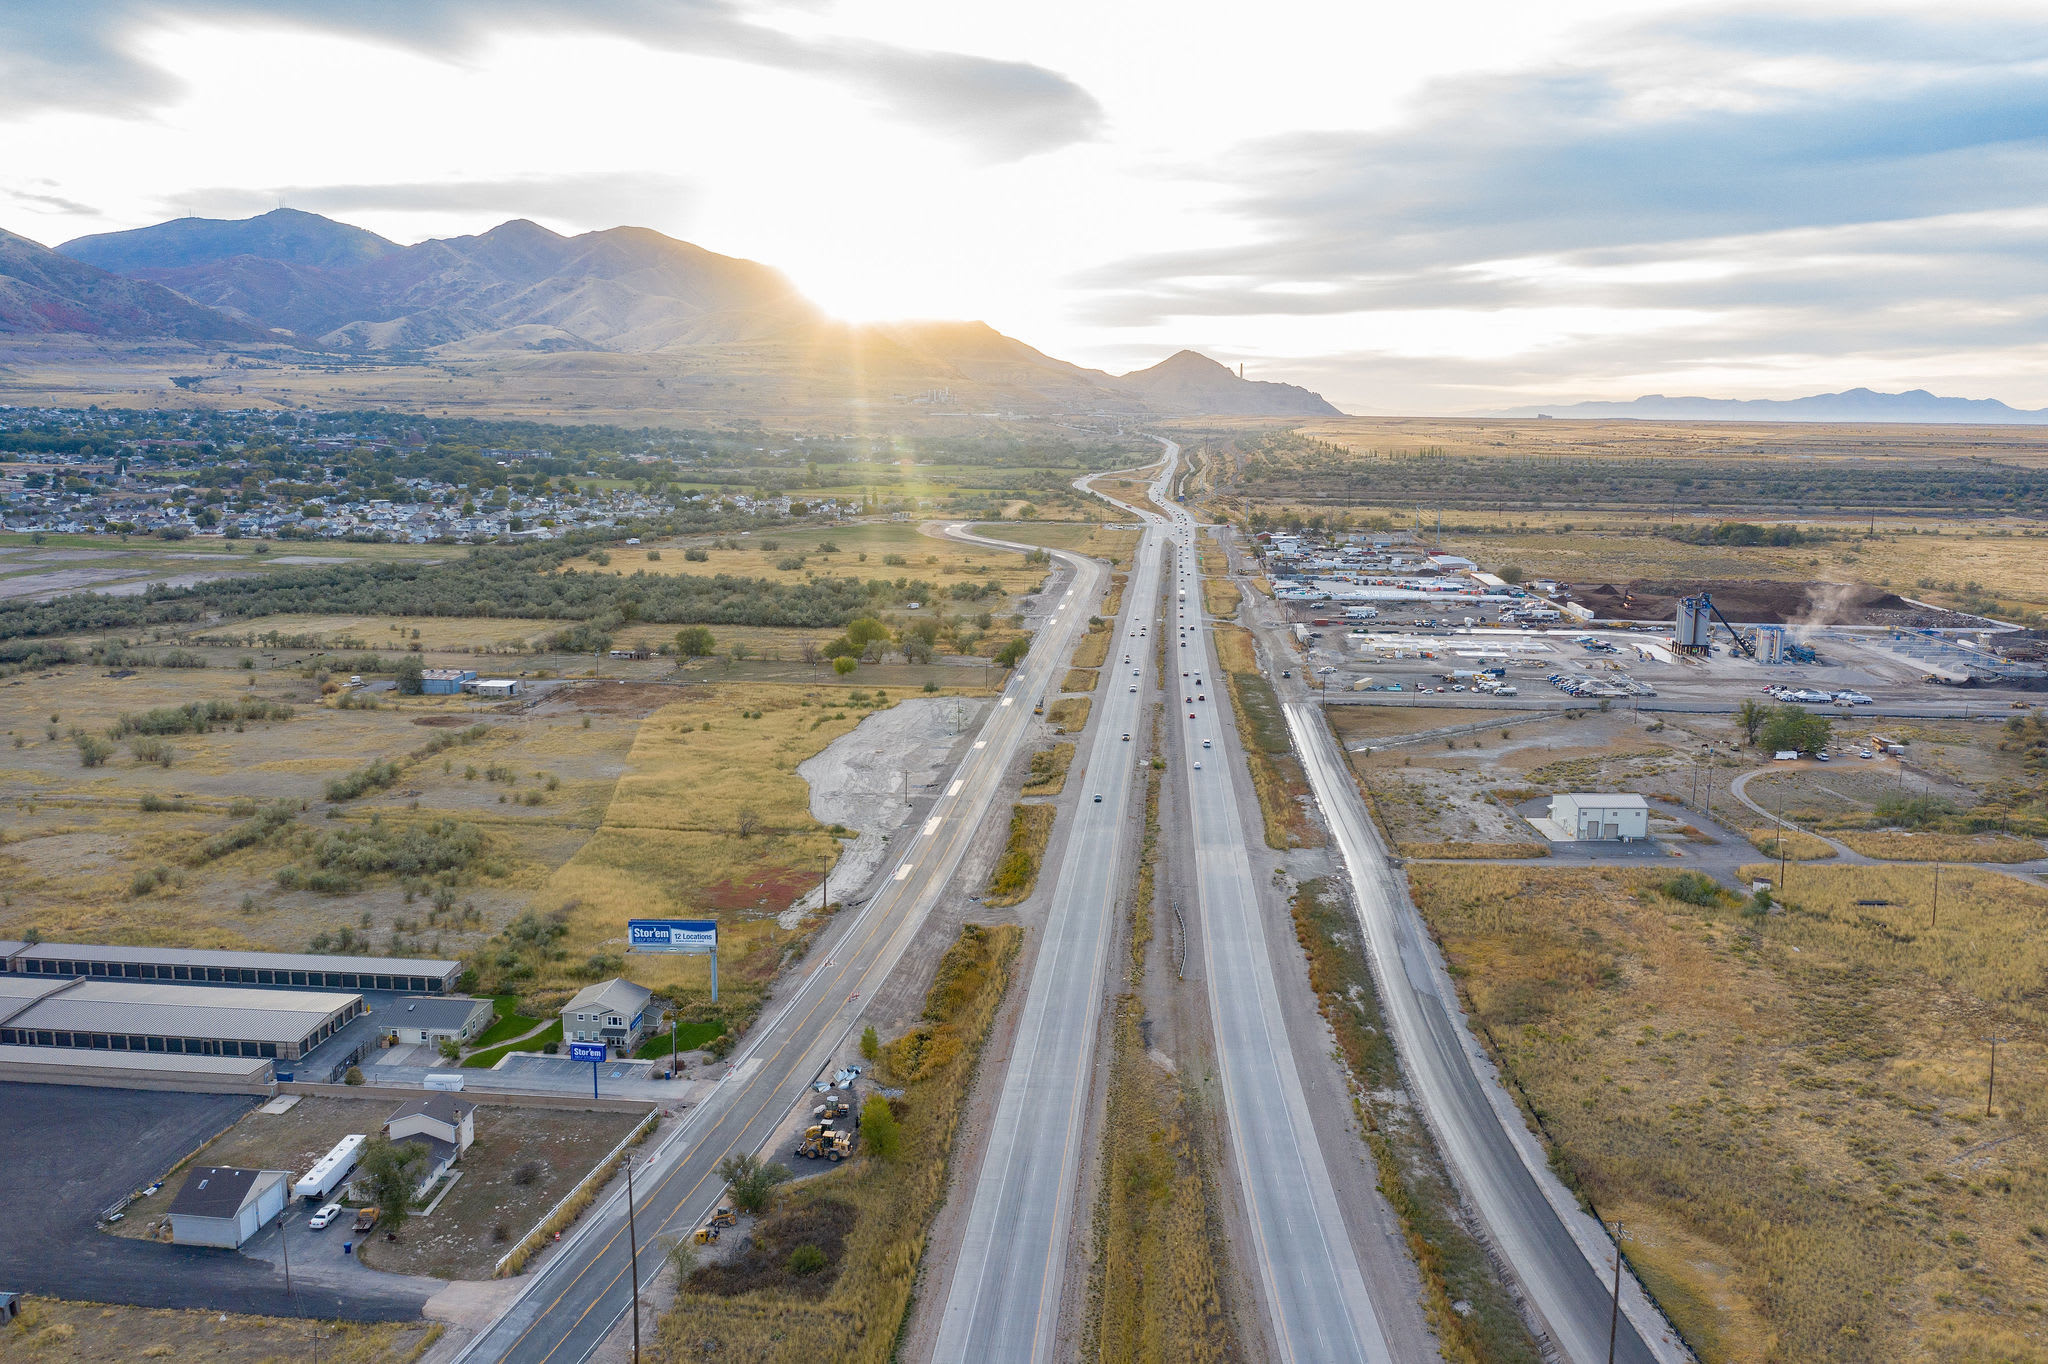 Aerial view of highway near Stor'em Self Storage in Magna, Utah